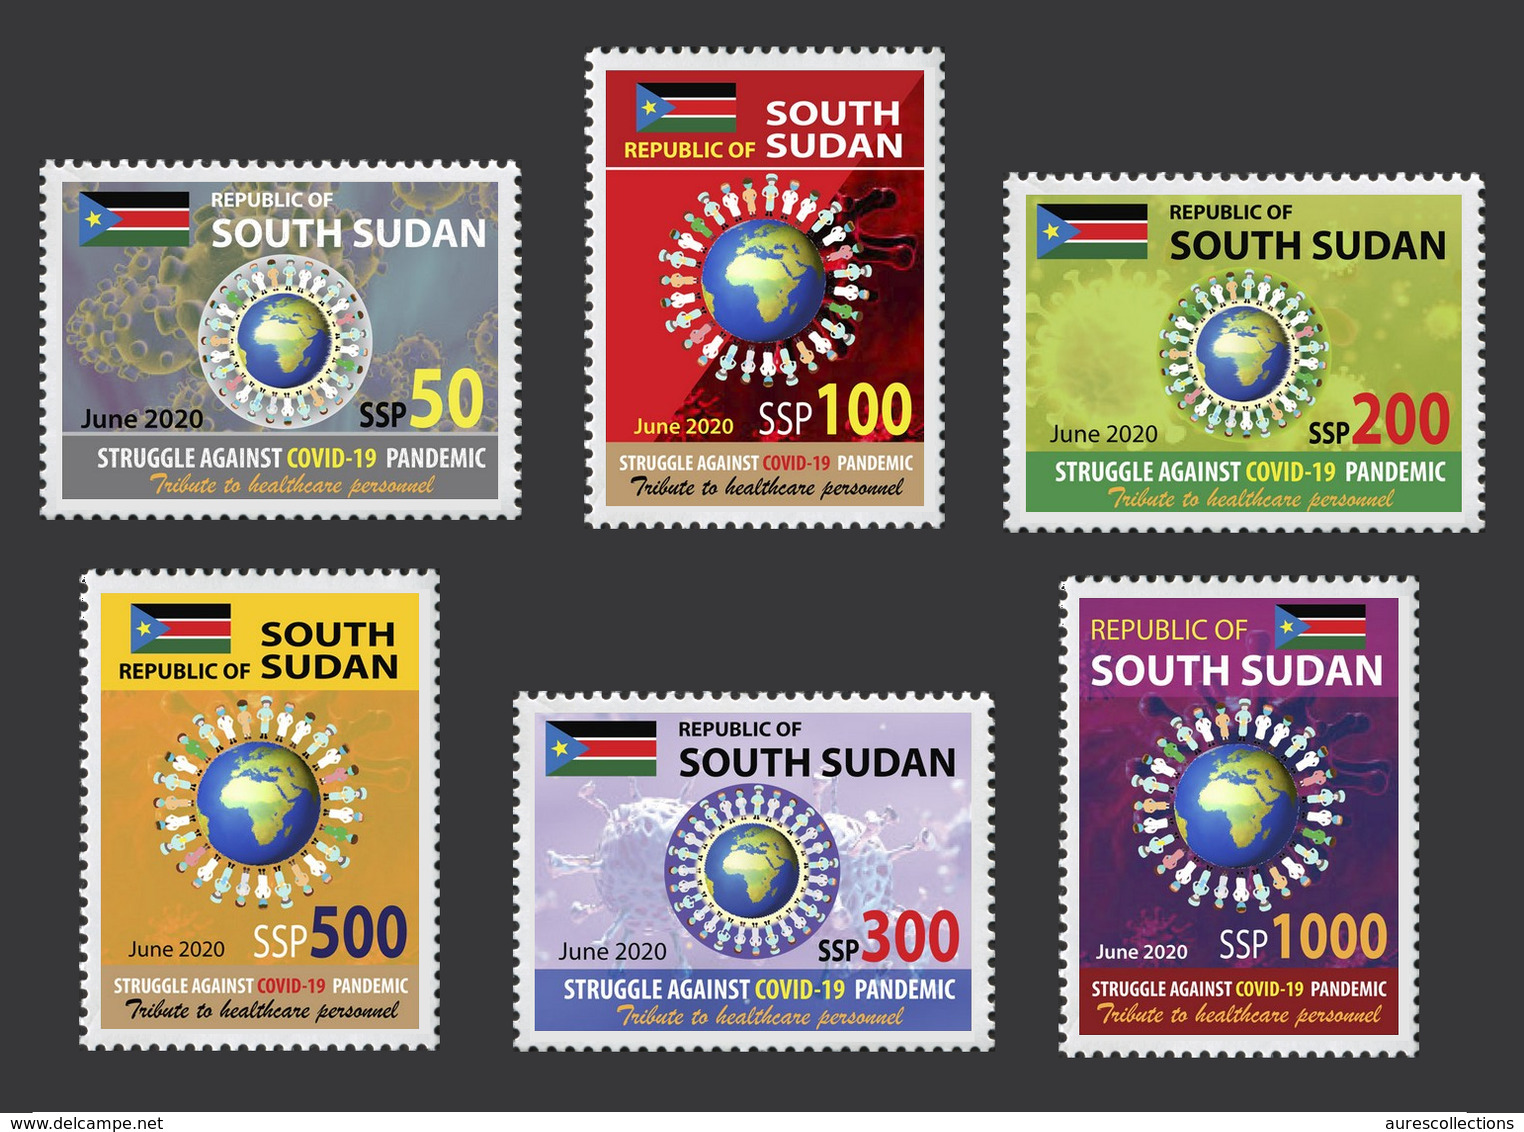 SOUTH SUDAN 2020 - FULL SET - JOINT ISSUE - COVID-19 PANDEMIC PANDEMIE CORONA CORONAVIRUS RARE MNH - Gezamelijke Uitgaven